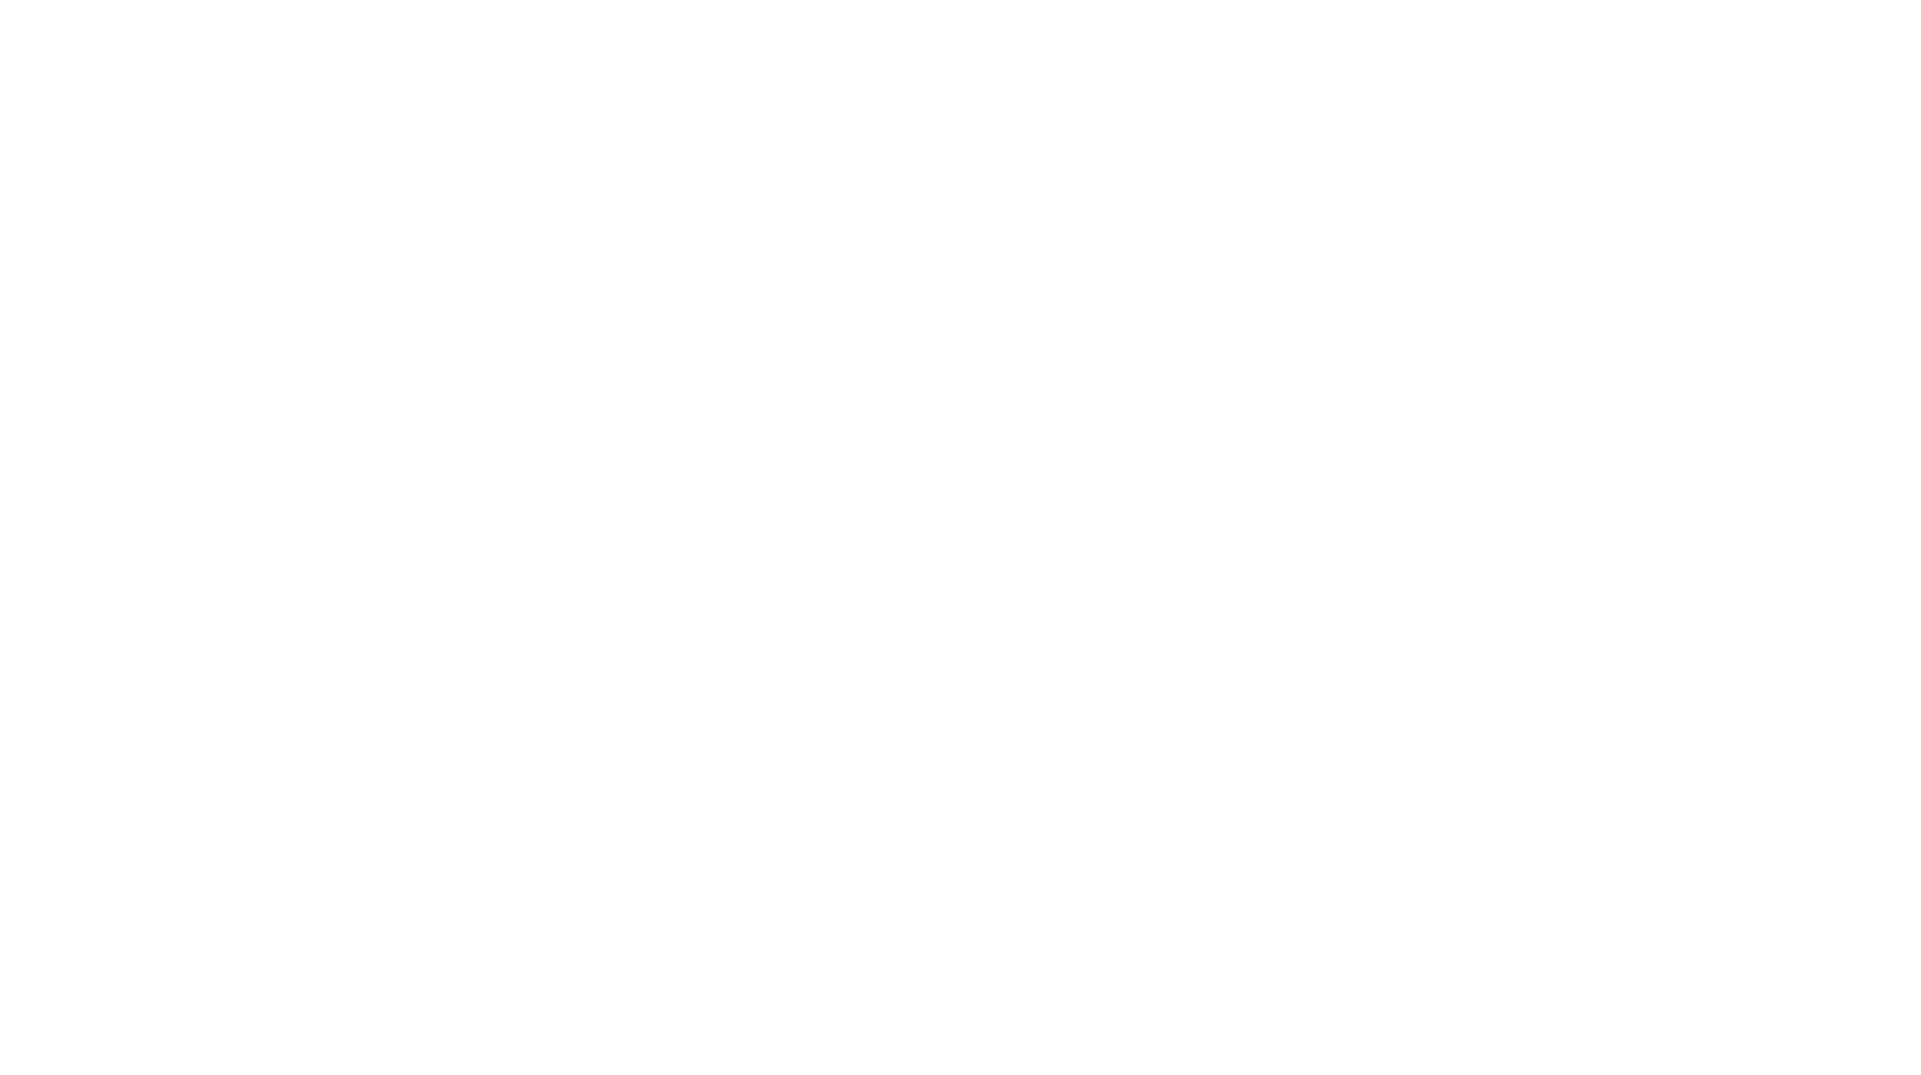 logo–phone2(-white-)-big-size